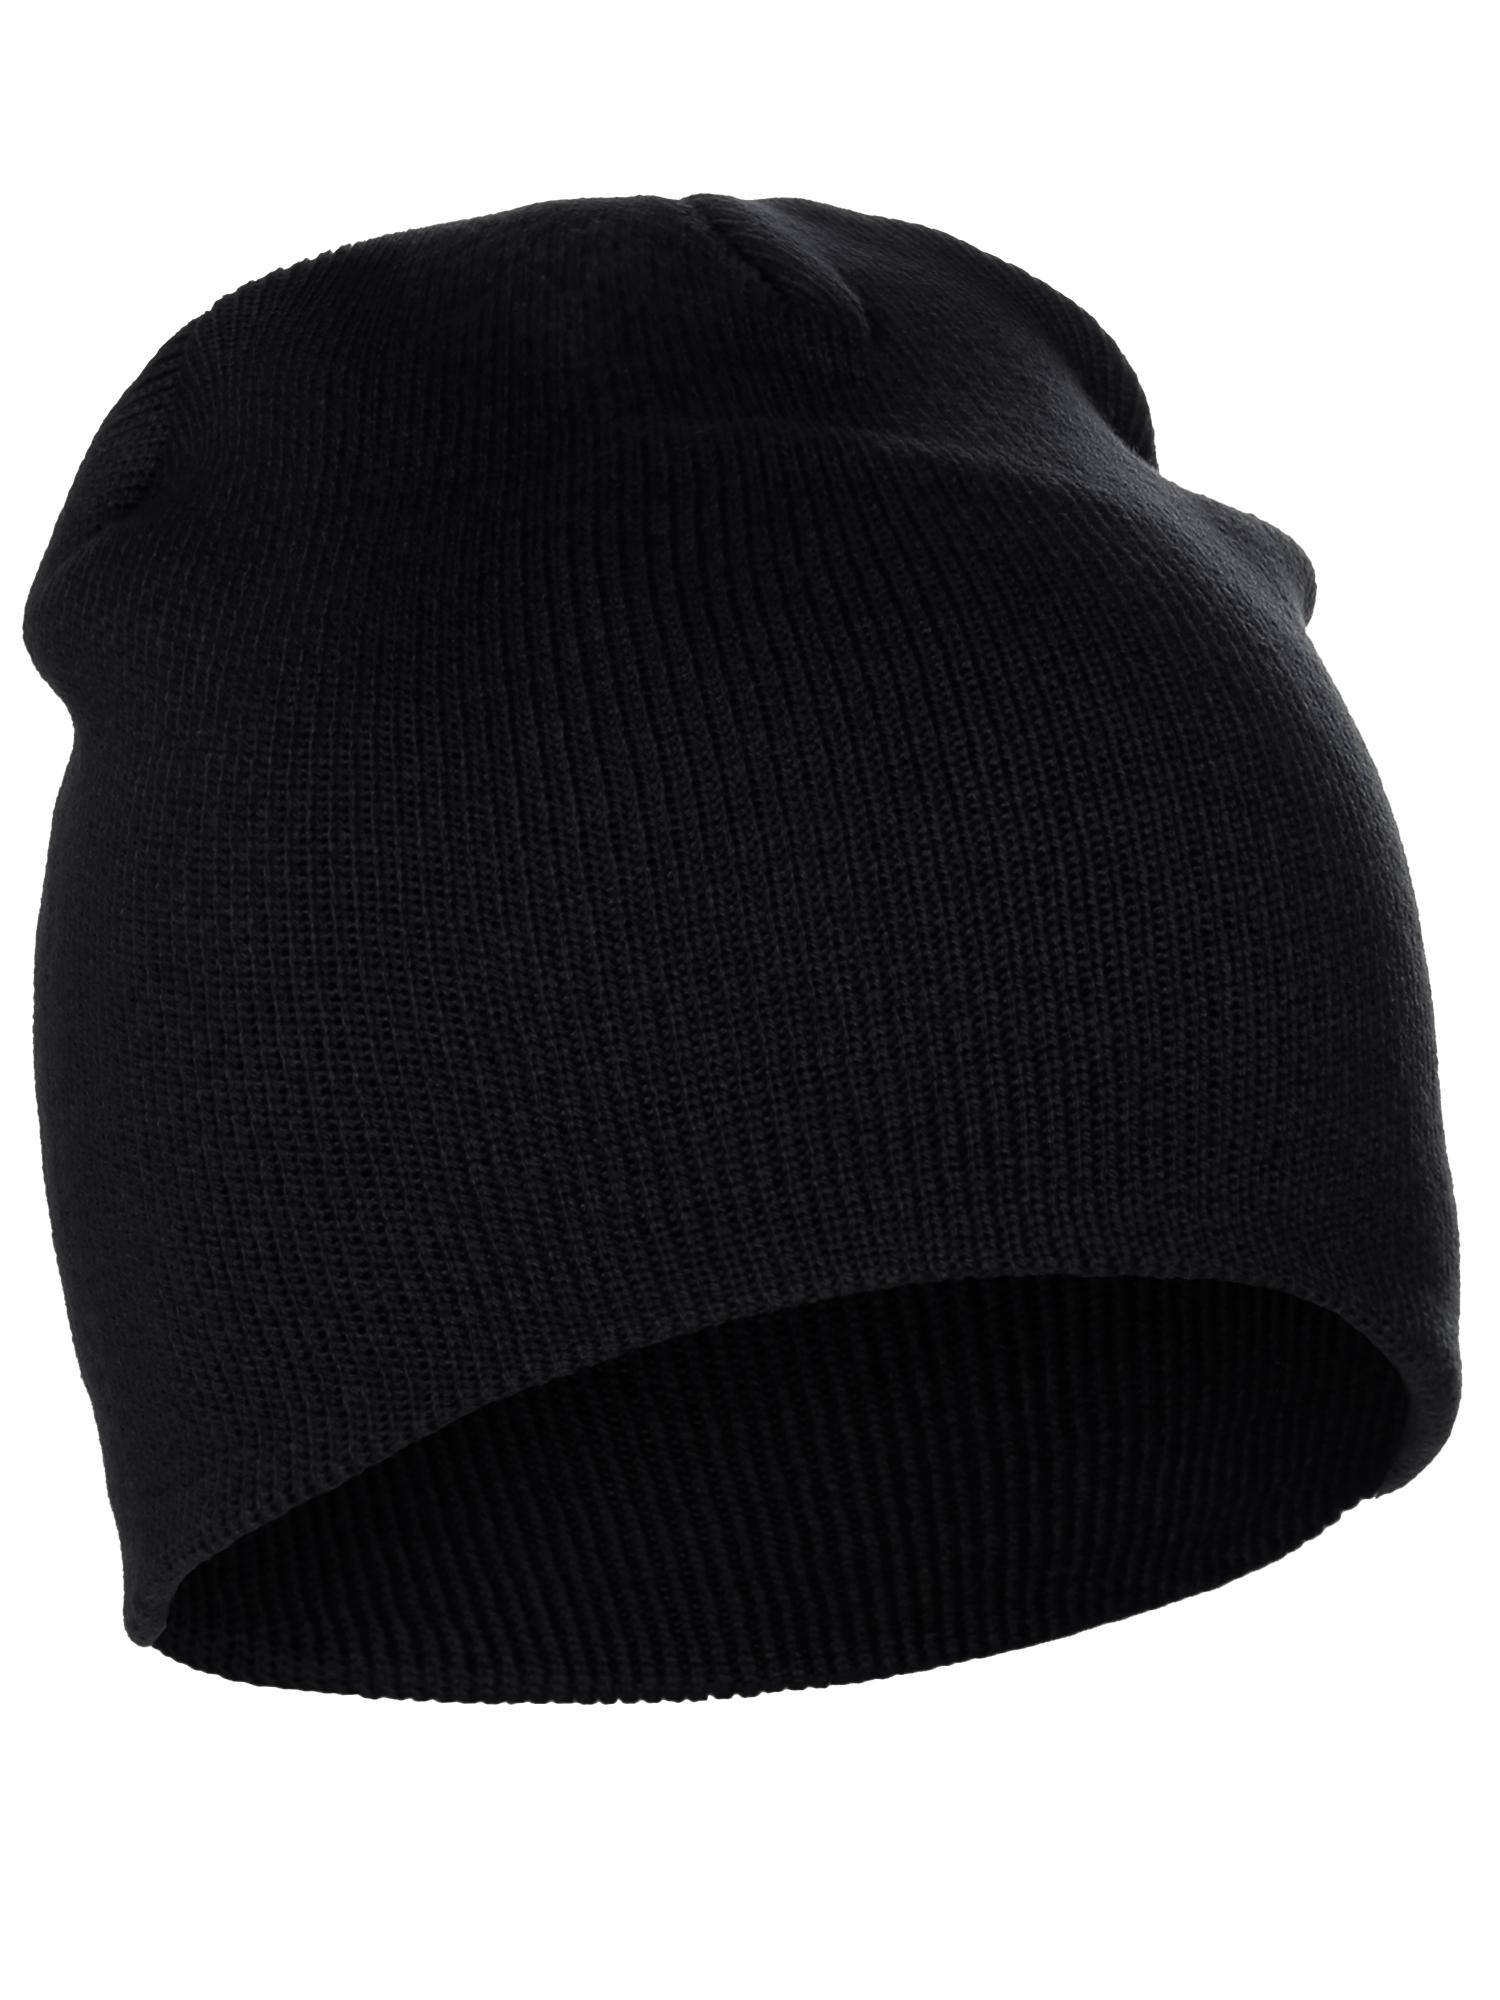 8e44f95adfcb9b Classic Pain Cuffless Beanie Winter Knit Hat Skully Cap Unisex